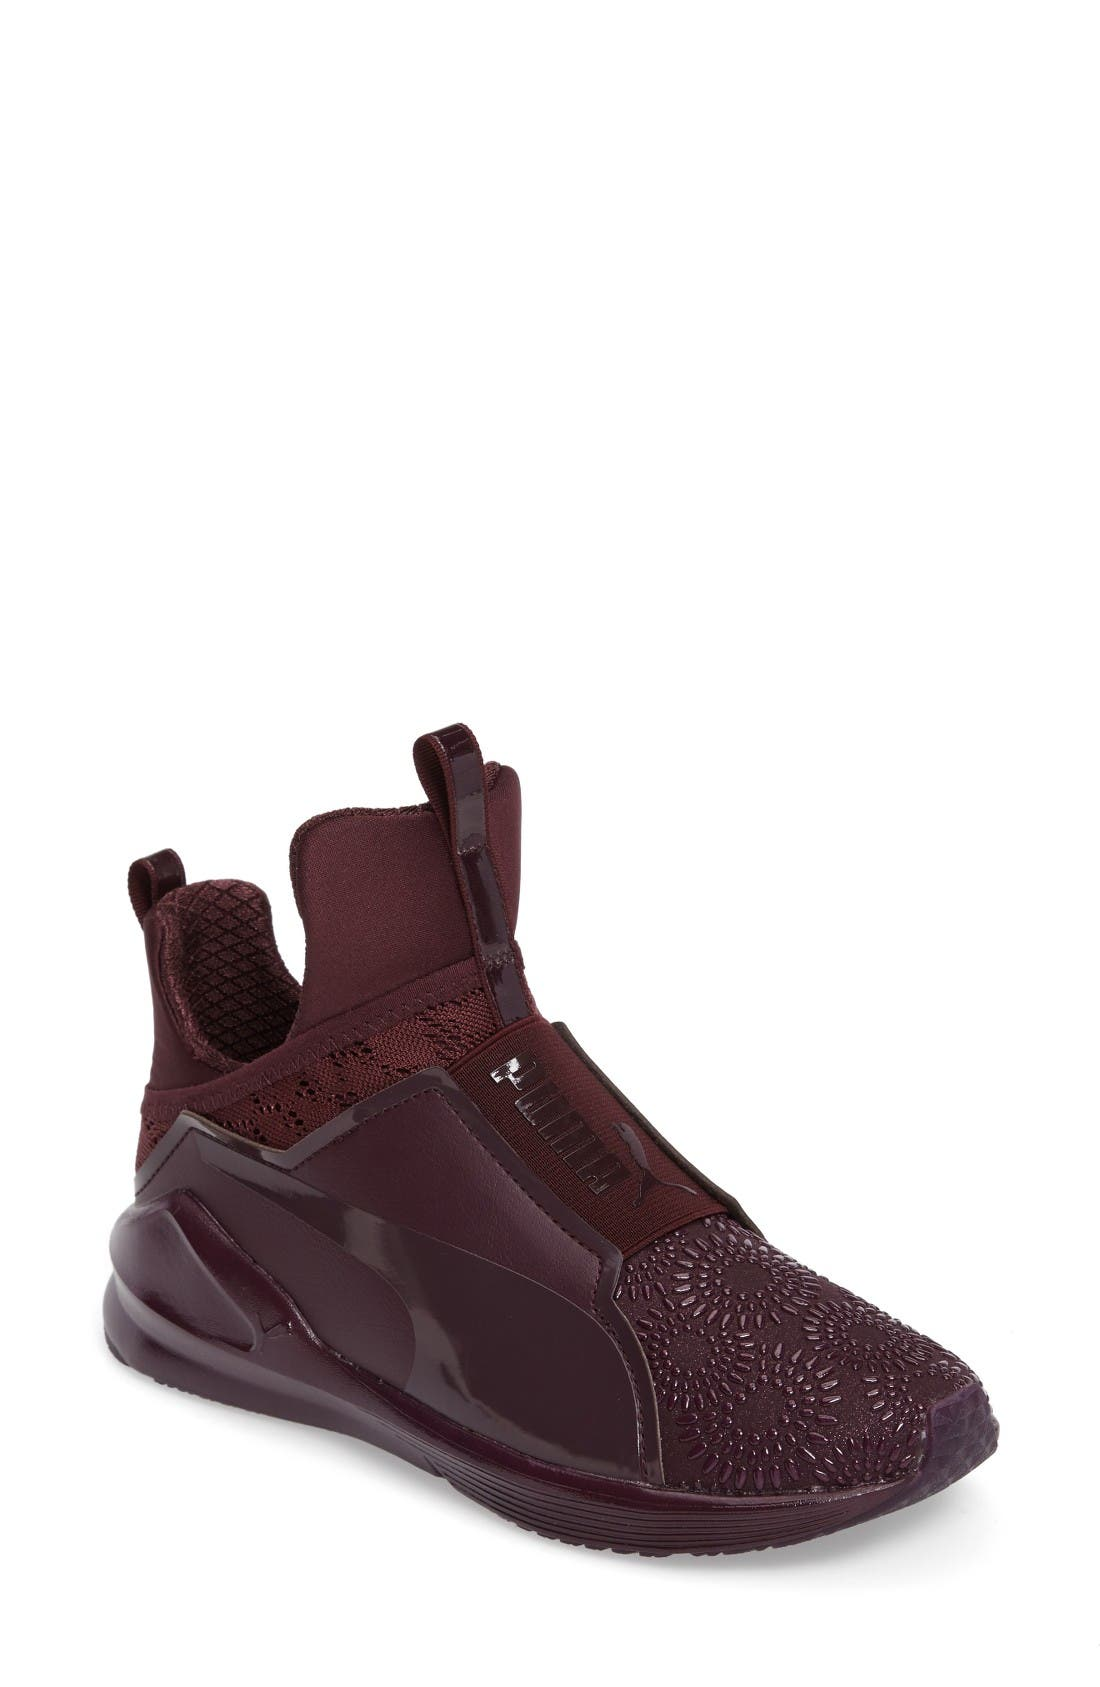 Fierce KRM High Top Sneaker,                             Main thumbnail 1, color,                             Red Plum